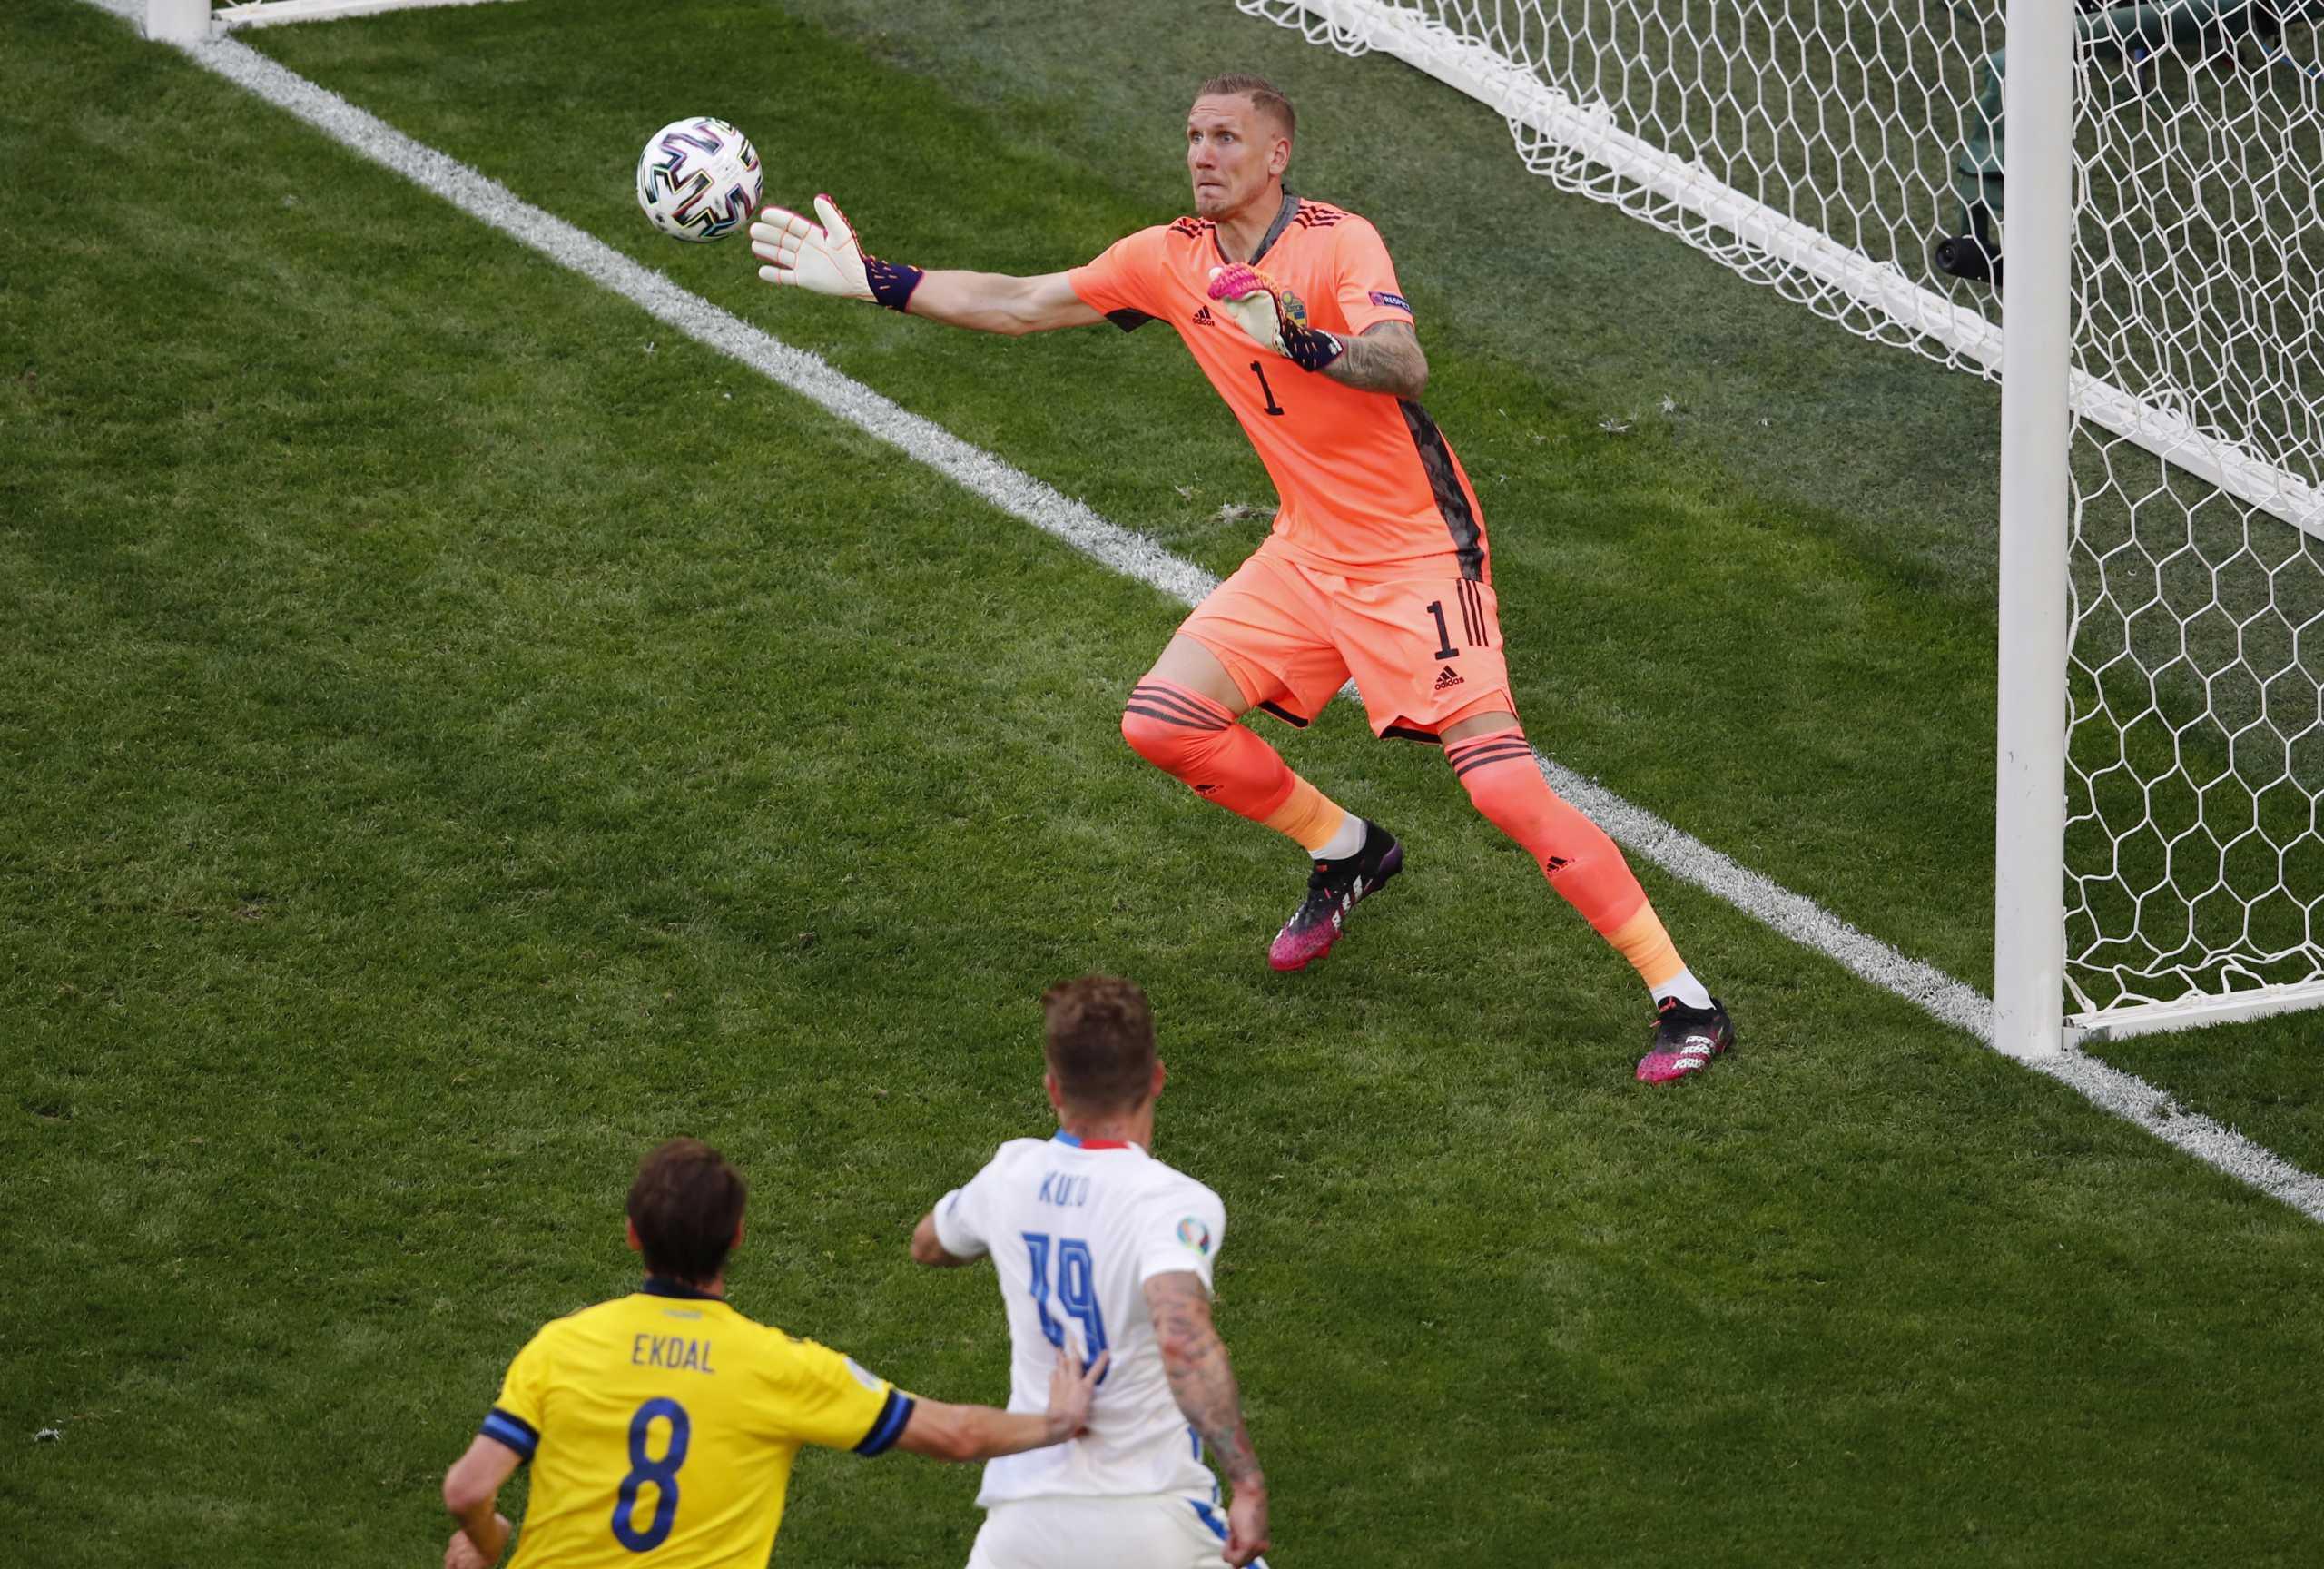 Euro 2020, Σουηδία – Σλοβακία: «Ιπτάμενοι» Όλσεν και Ντουμπράβκα σε φοβερές επεμβάσεις